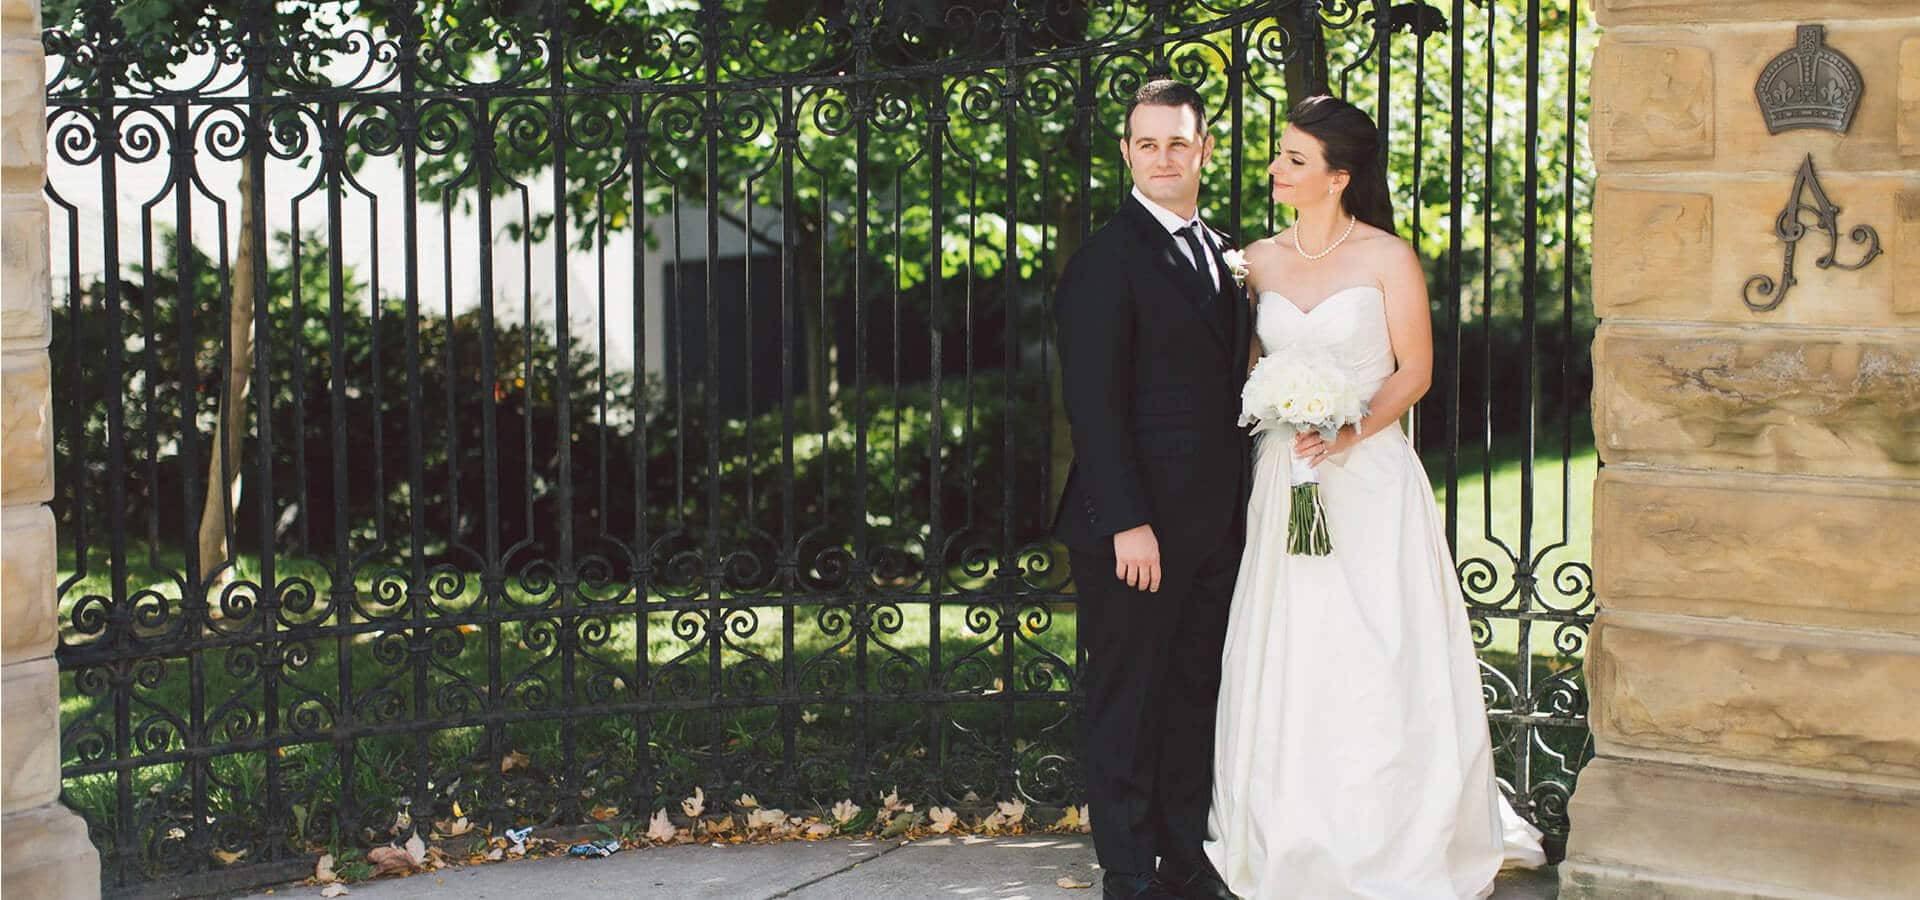 Hero image for Shana and Michael's Wedding at The Bram & Bluma Appel Salon